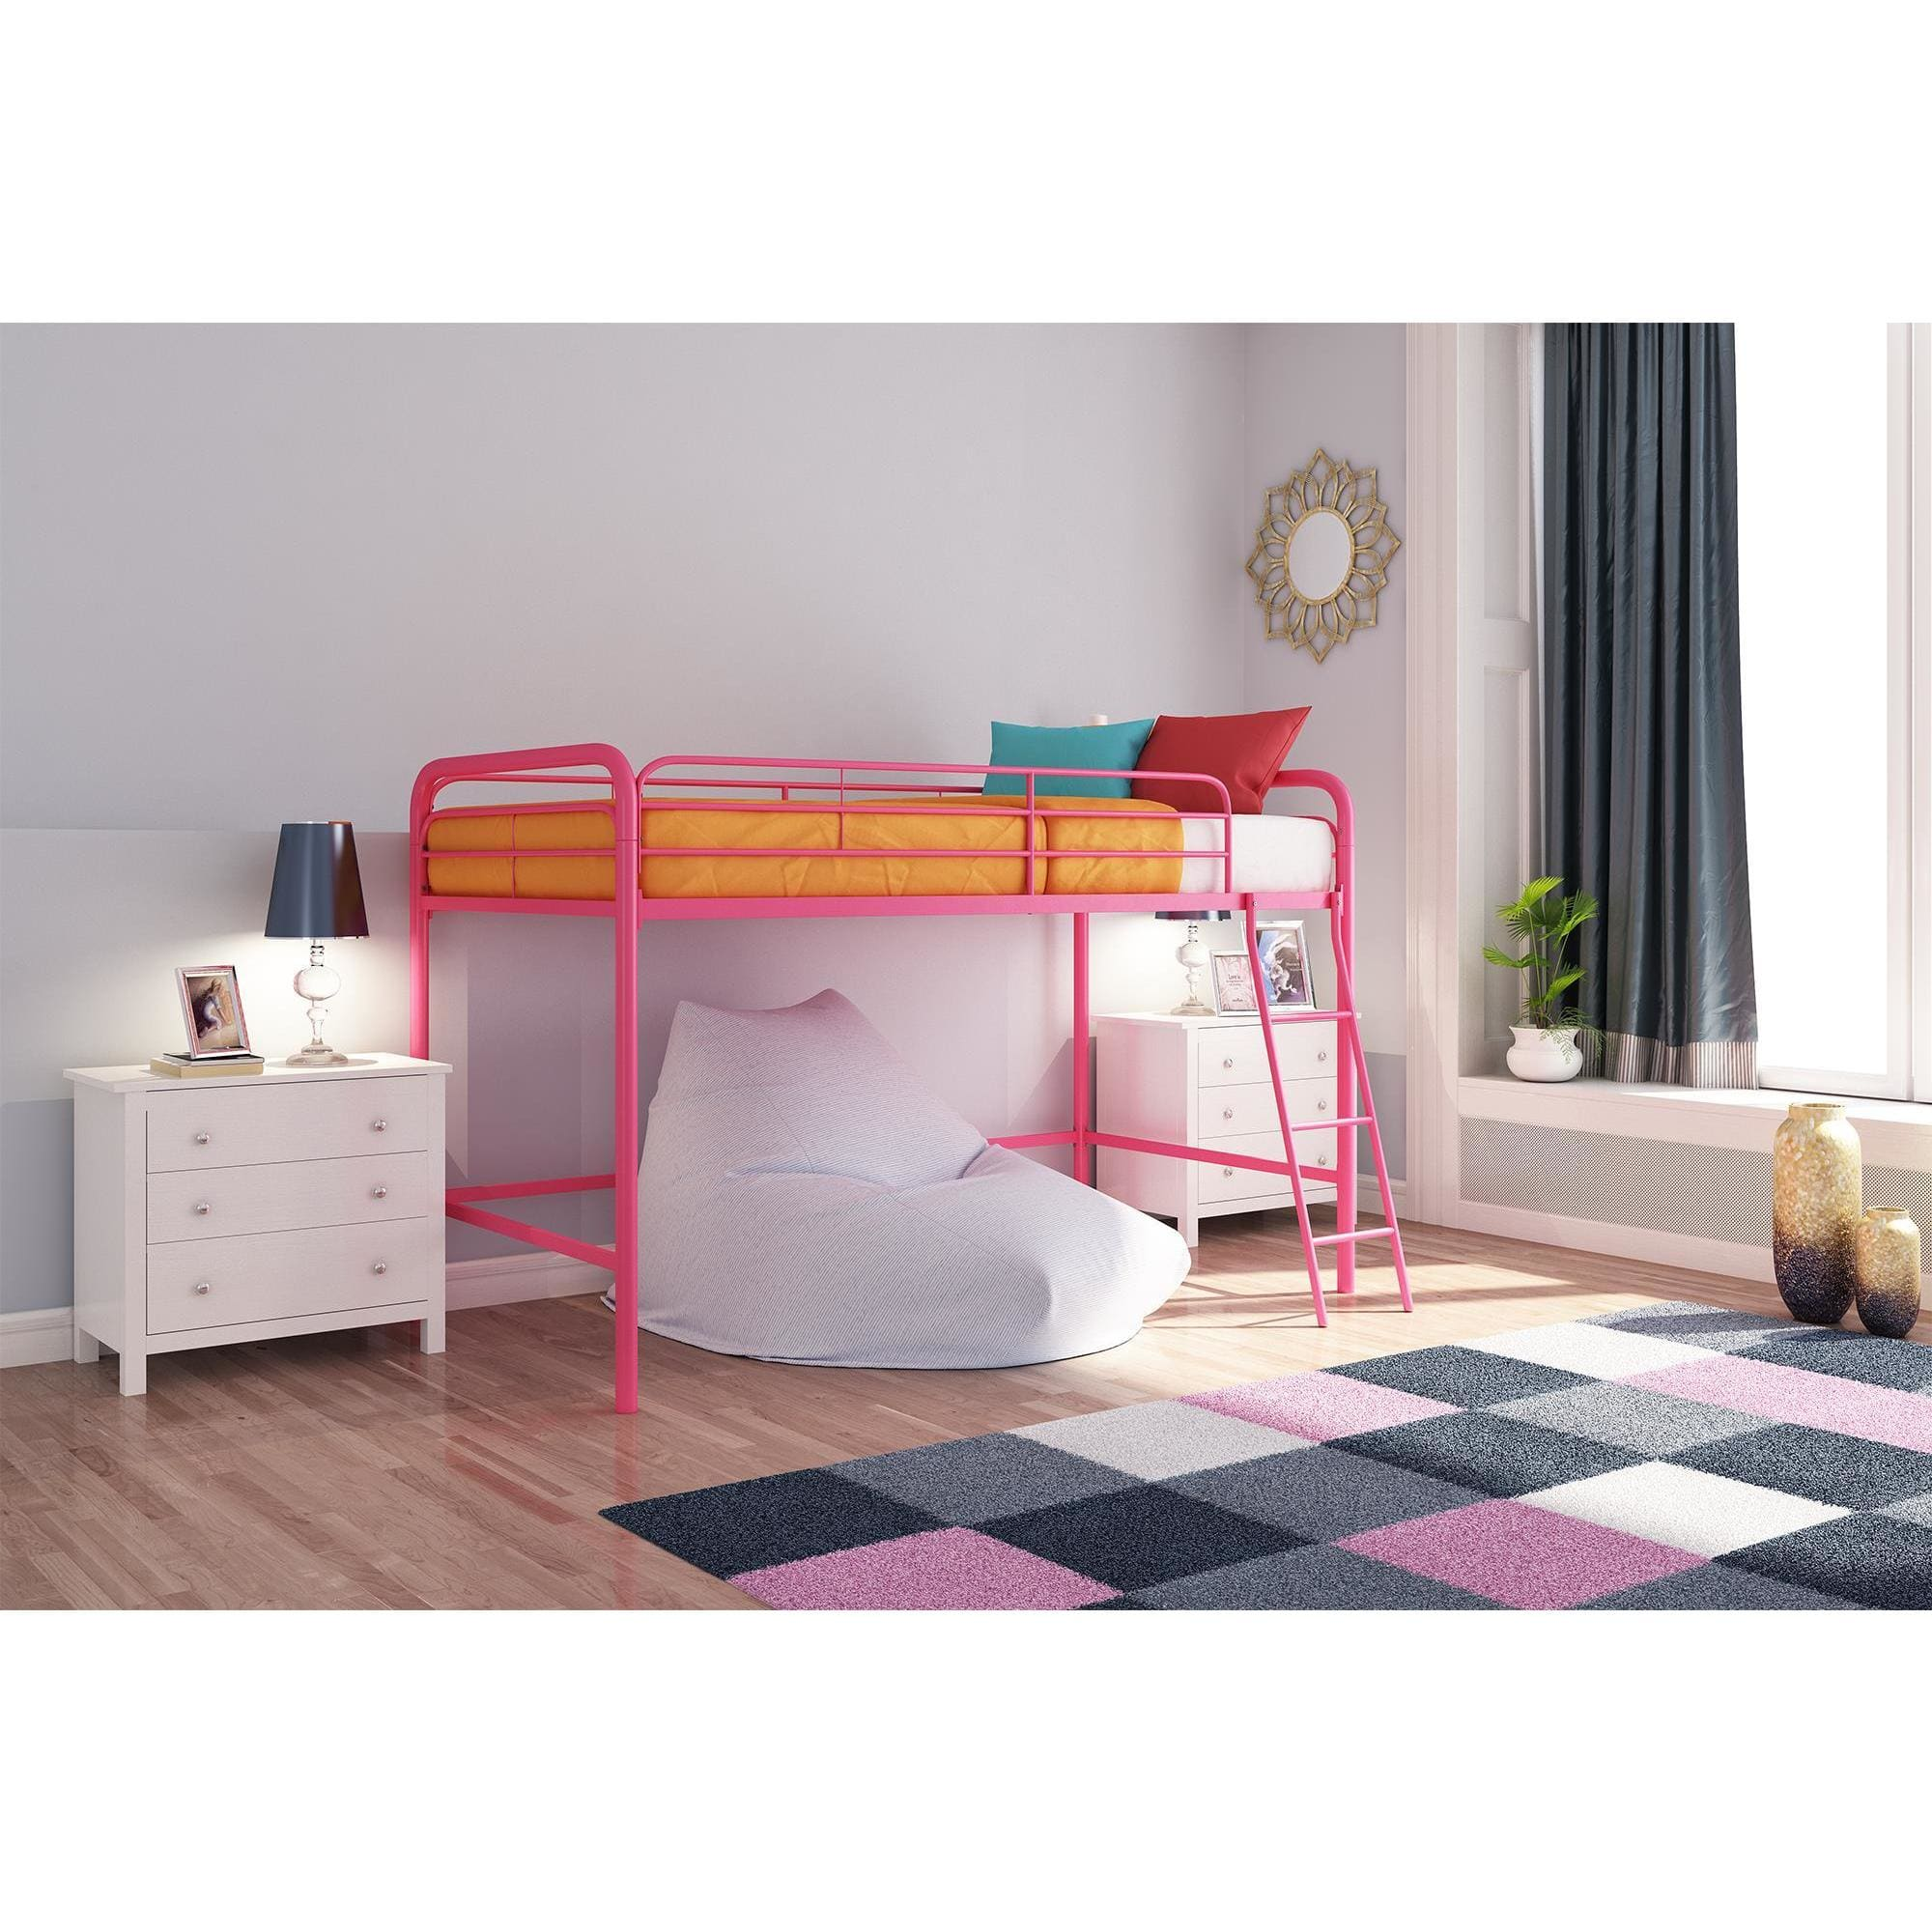 dhp junior metal loft bed twin size multiple colors walmart com